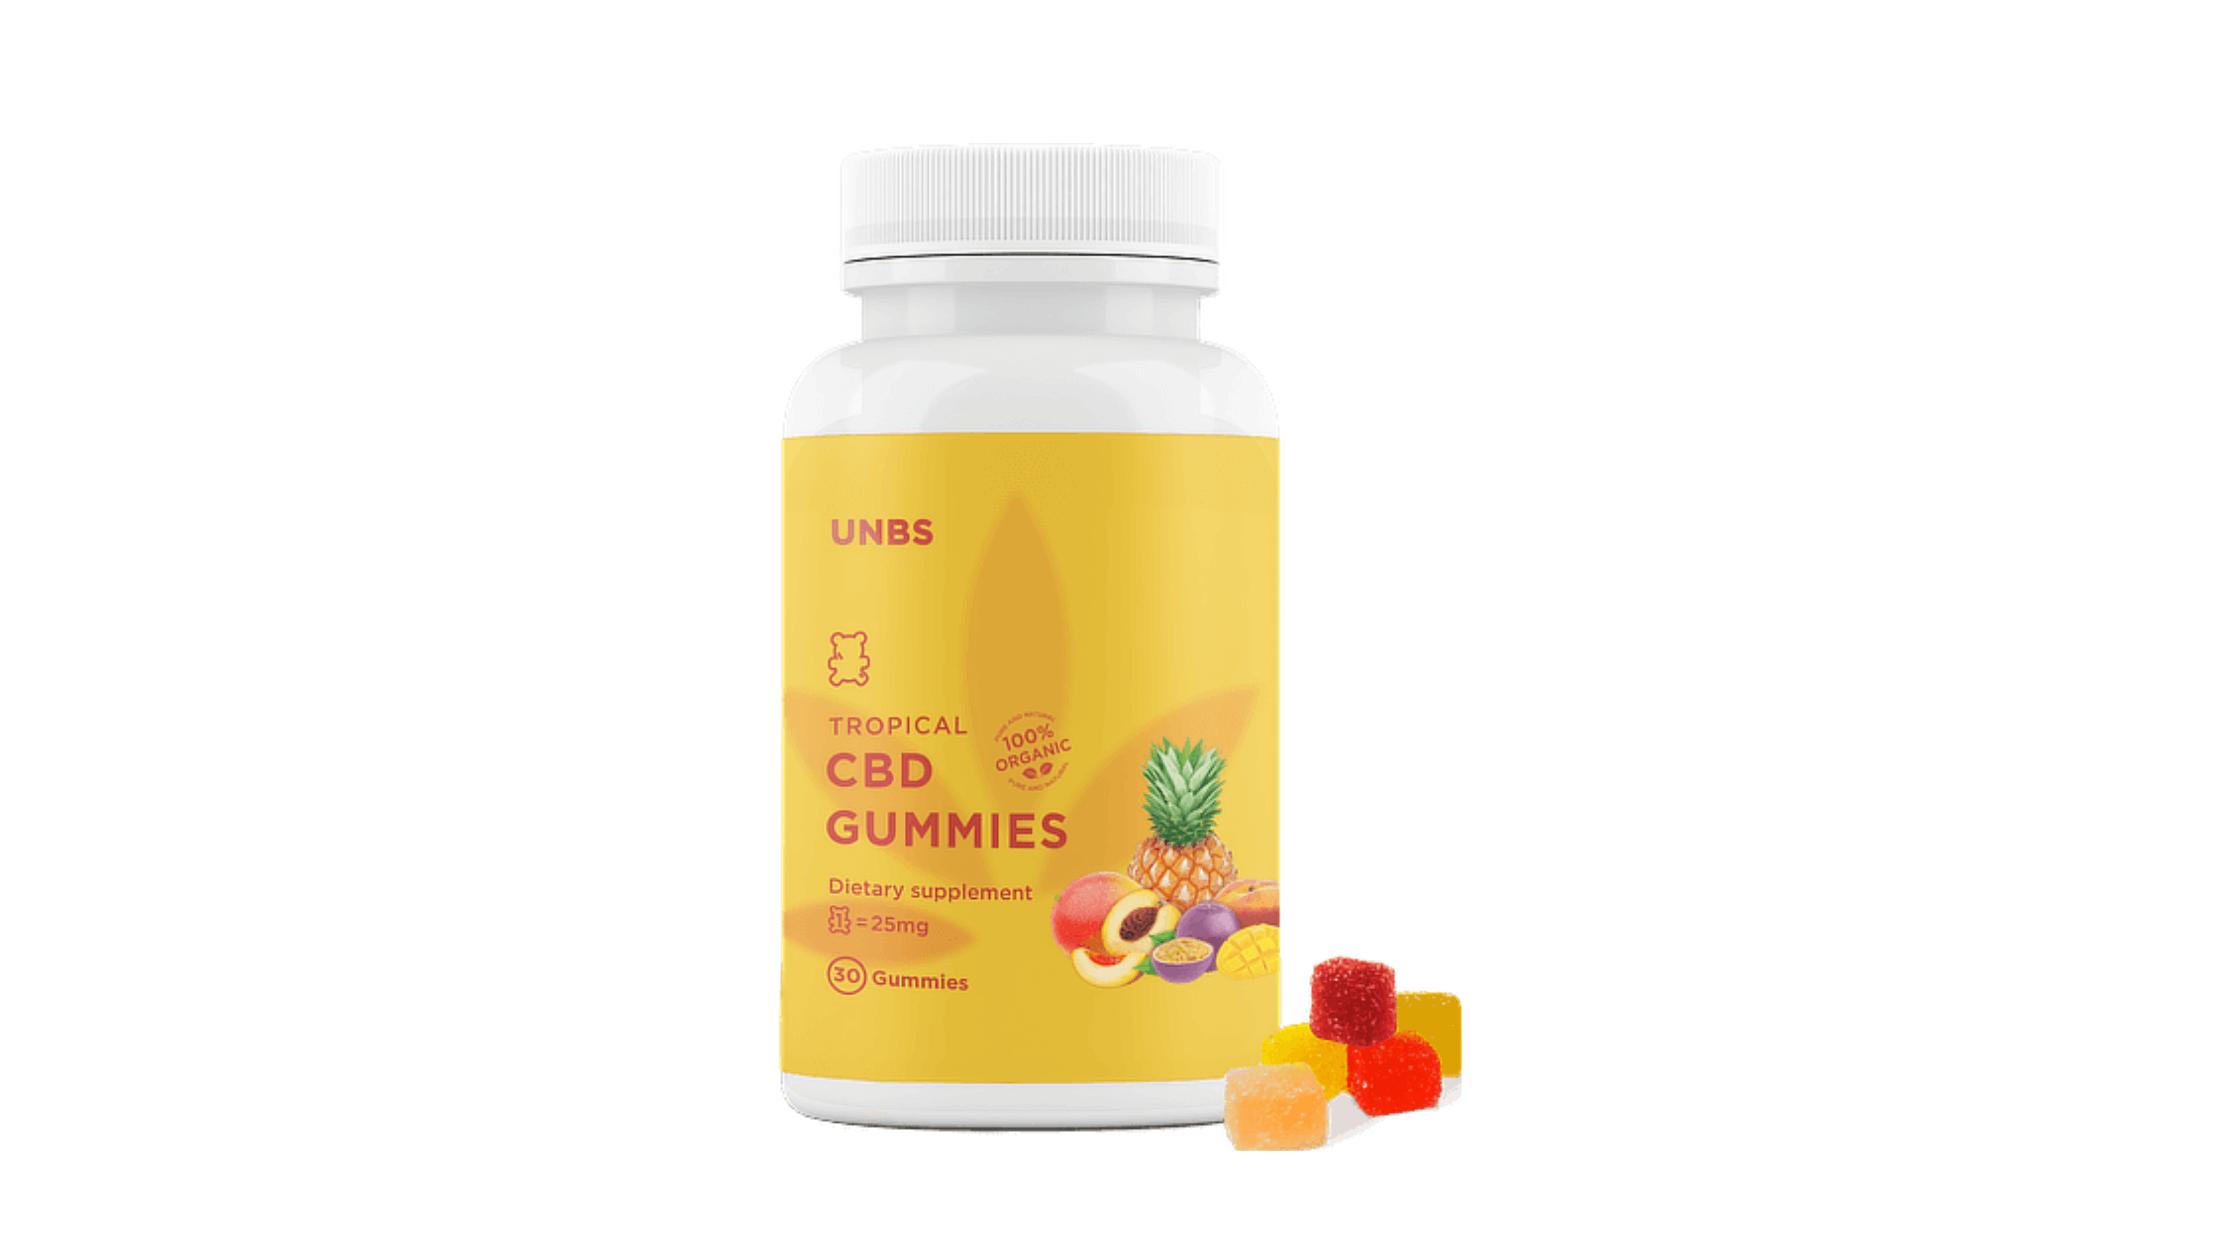 Tropical CBD Gummies Reviews